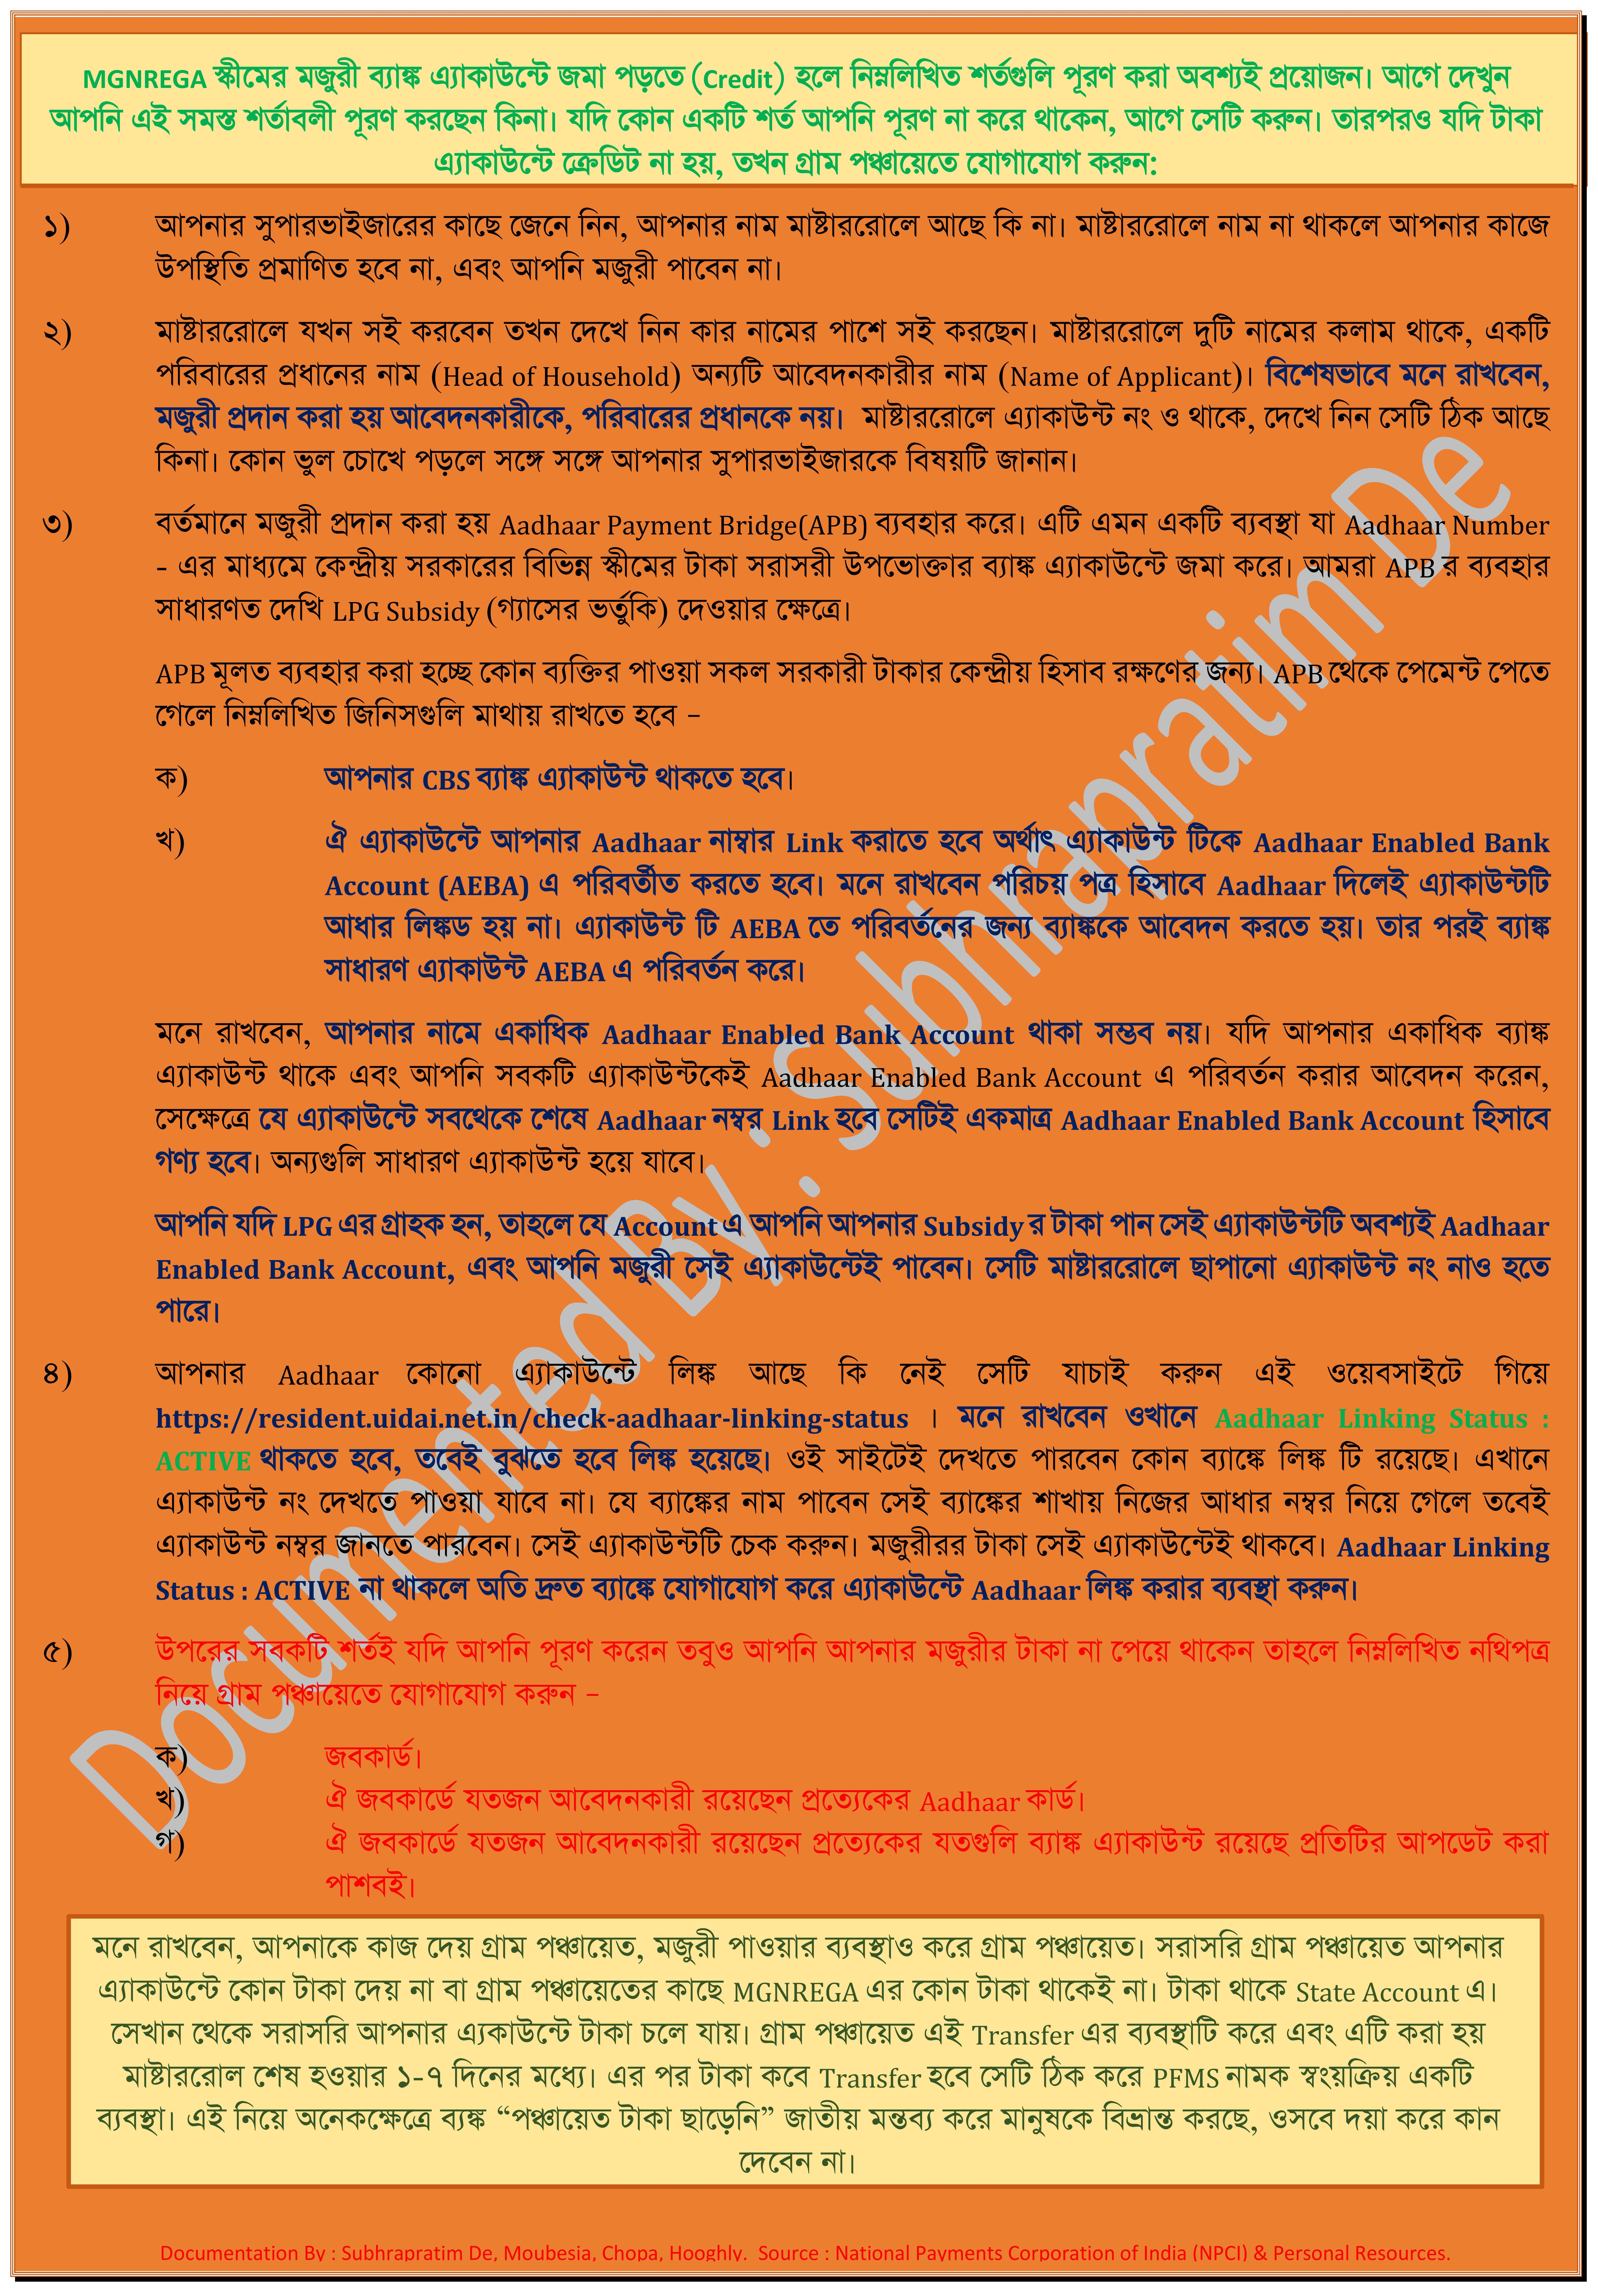 MGNREGA স্কীমের মজুরীর টাকা Bank Account এ Credit না হলে কী করবেন? 1